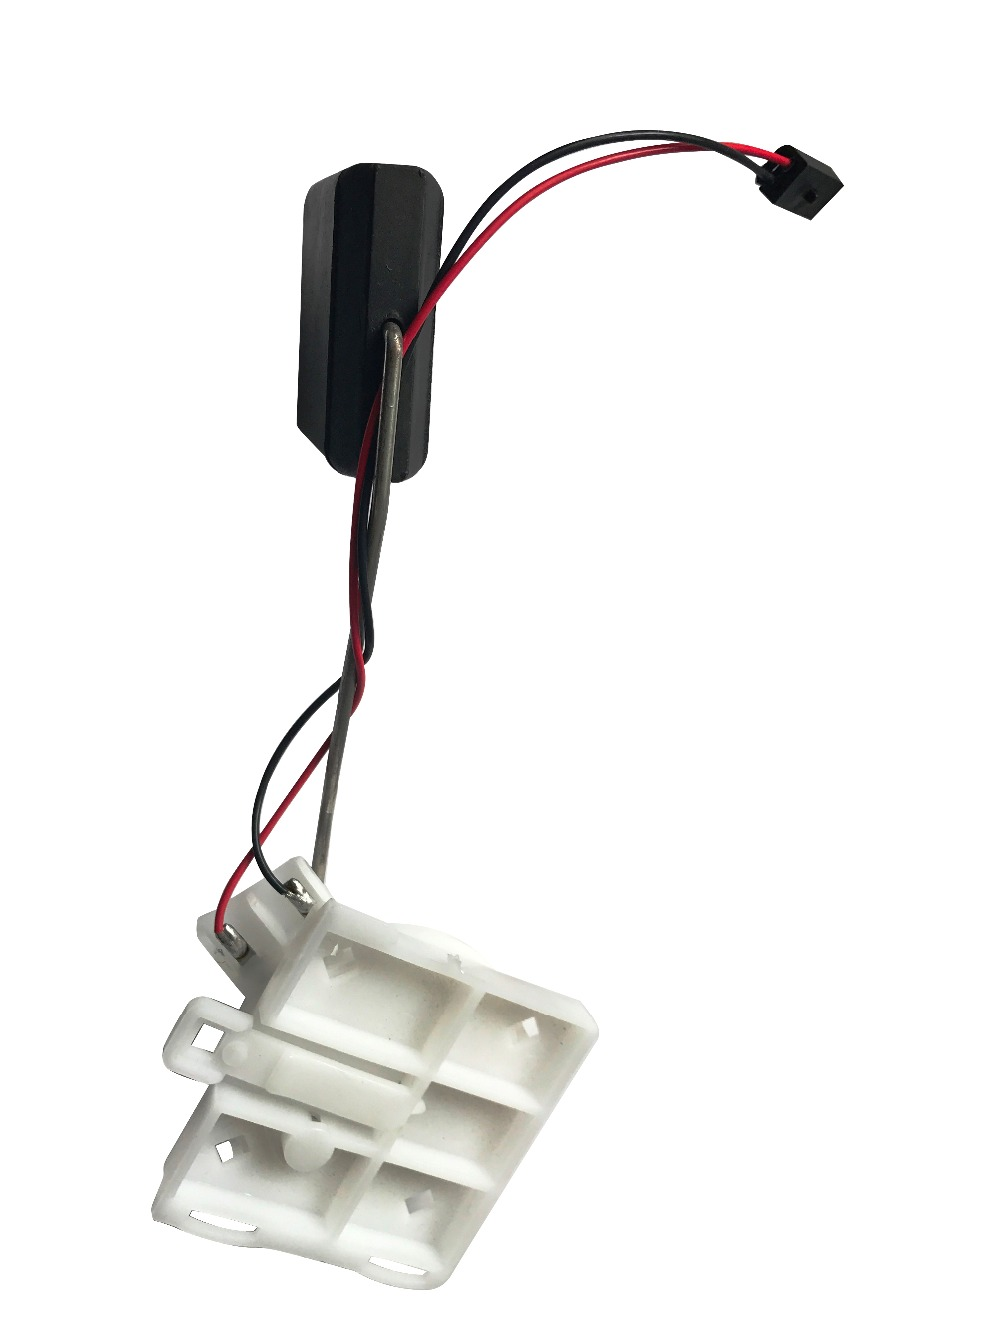 OE 93285974/93281637 Car parts Fuel level sensor FOR BUICK Chevrolet sail 01-03 Iron tank